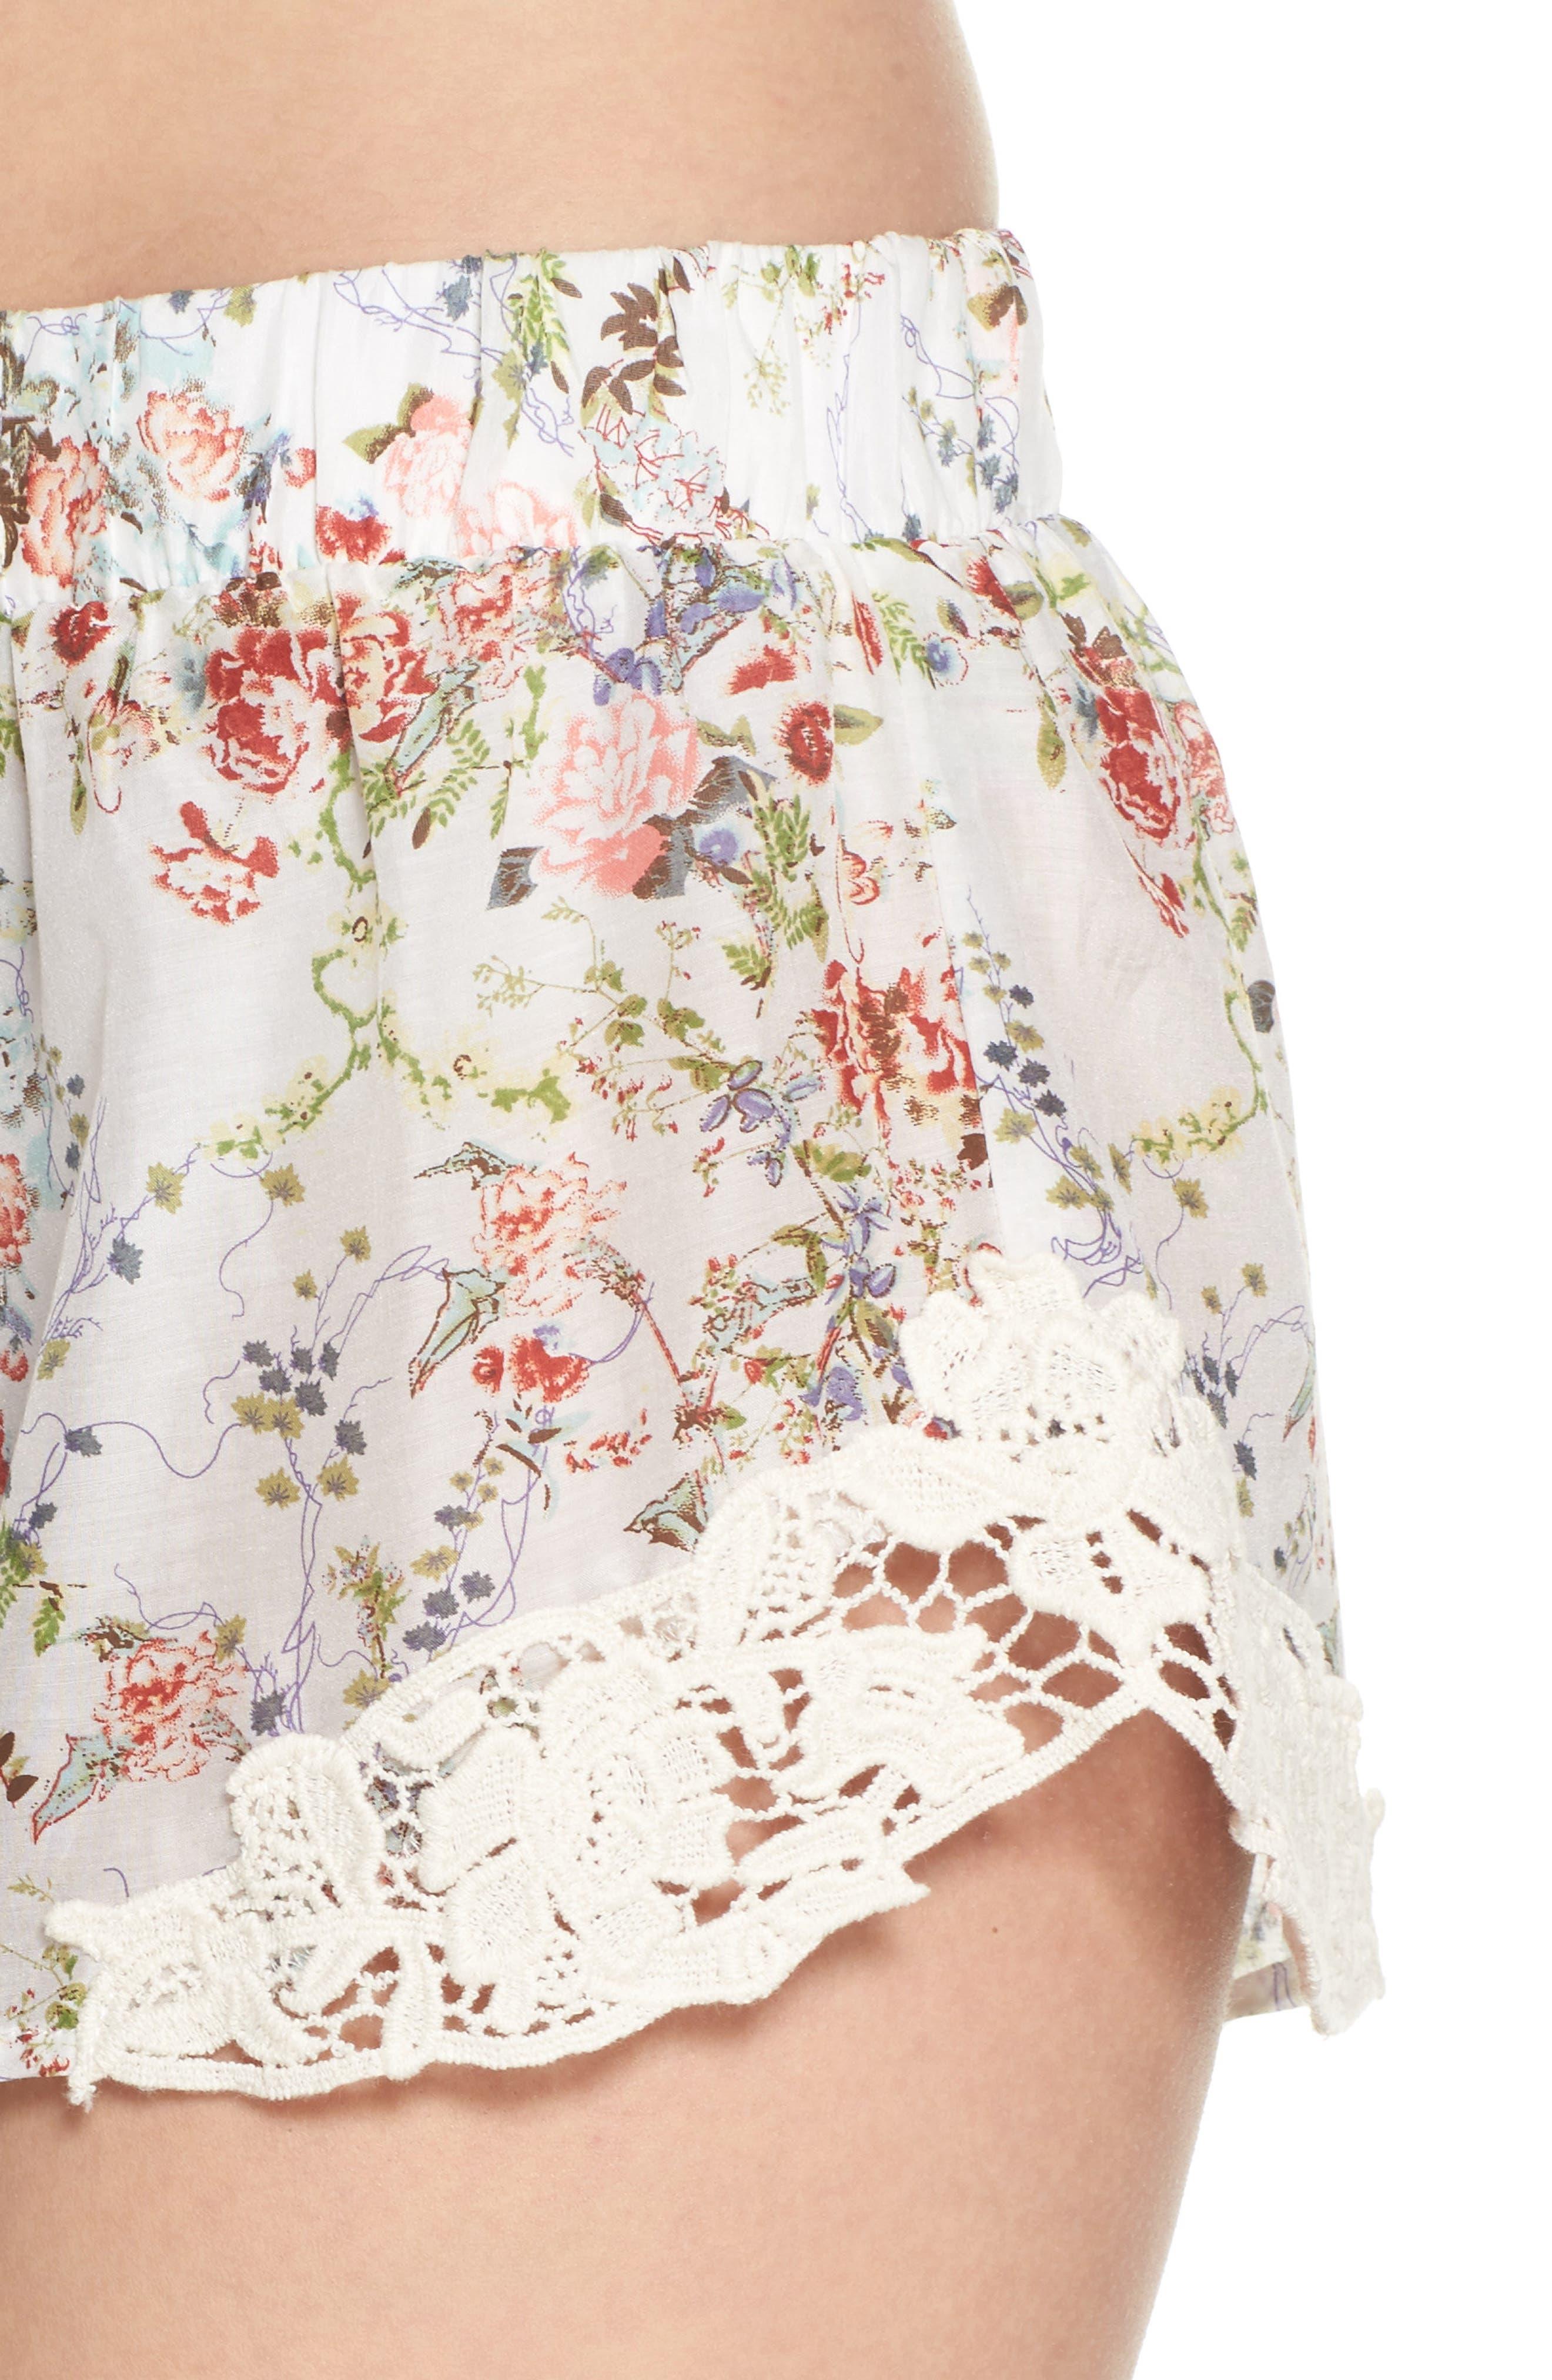 Yolly Floral Pajama Shorts,                             Alternate thumbnail 4, color,                             IVORY FLORAL